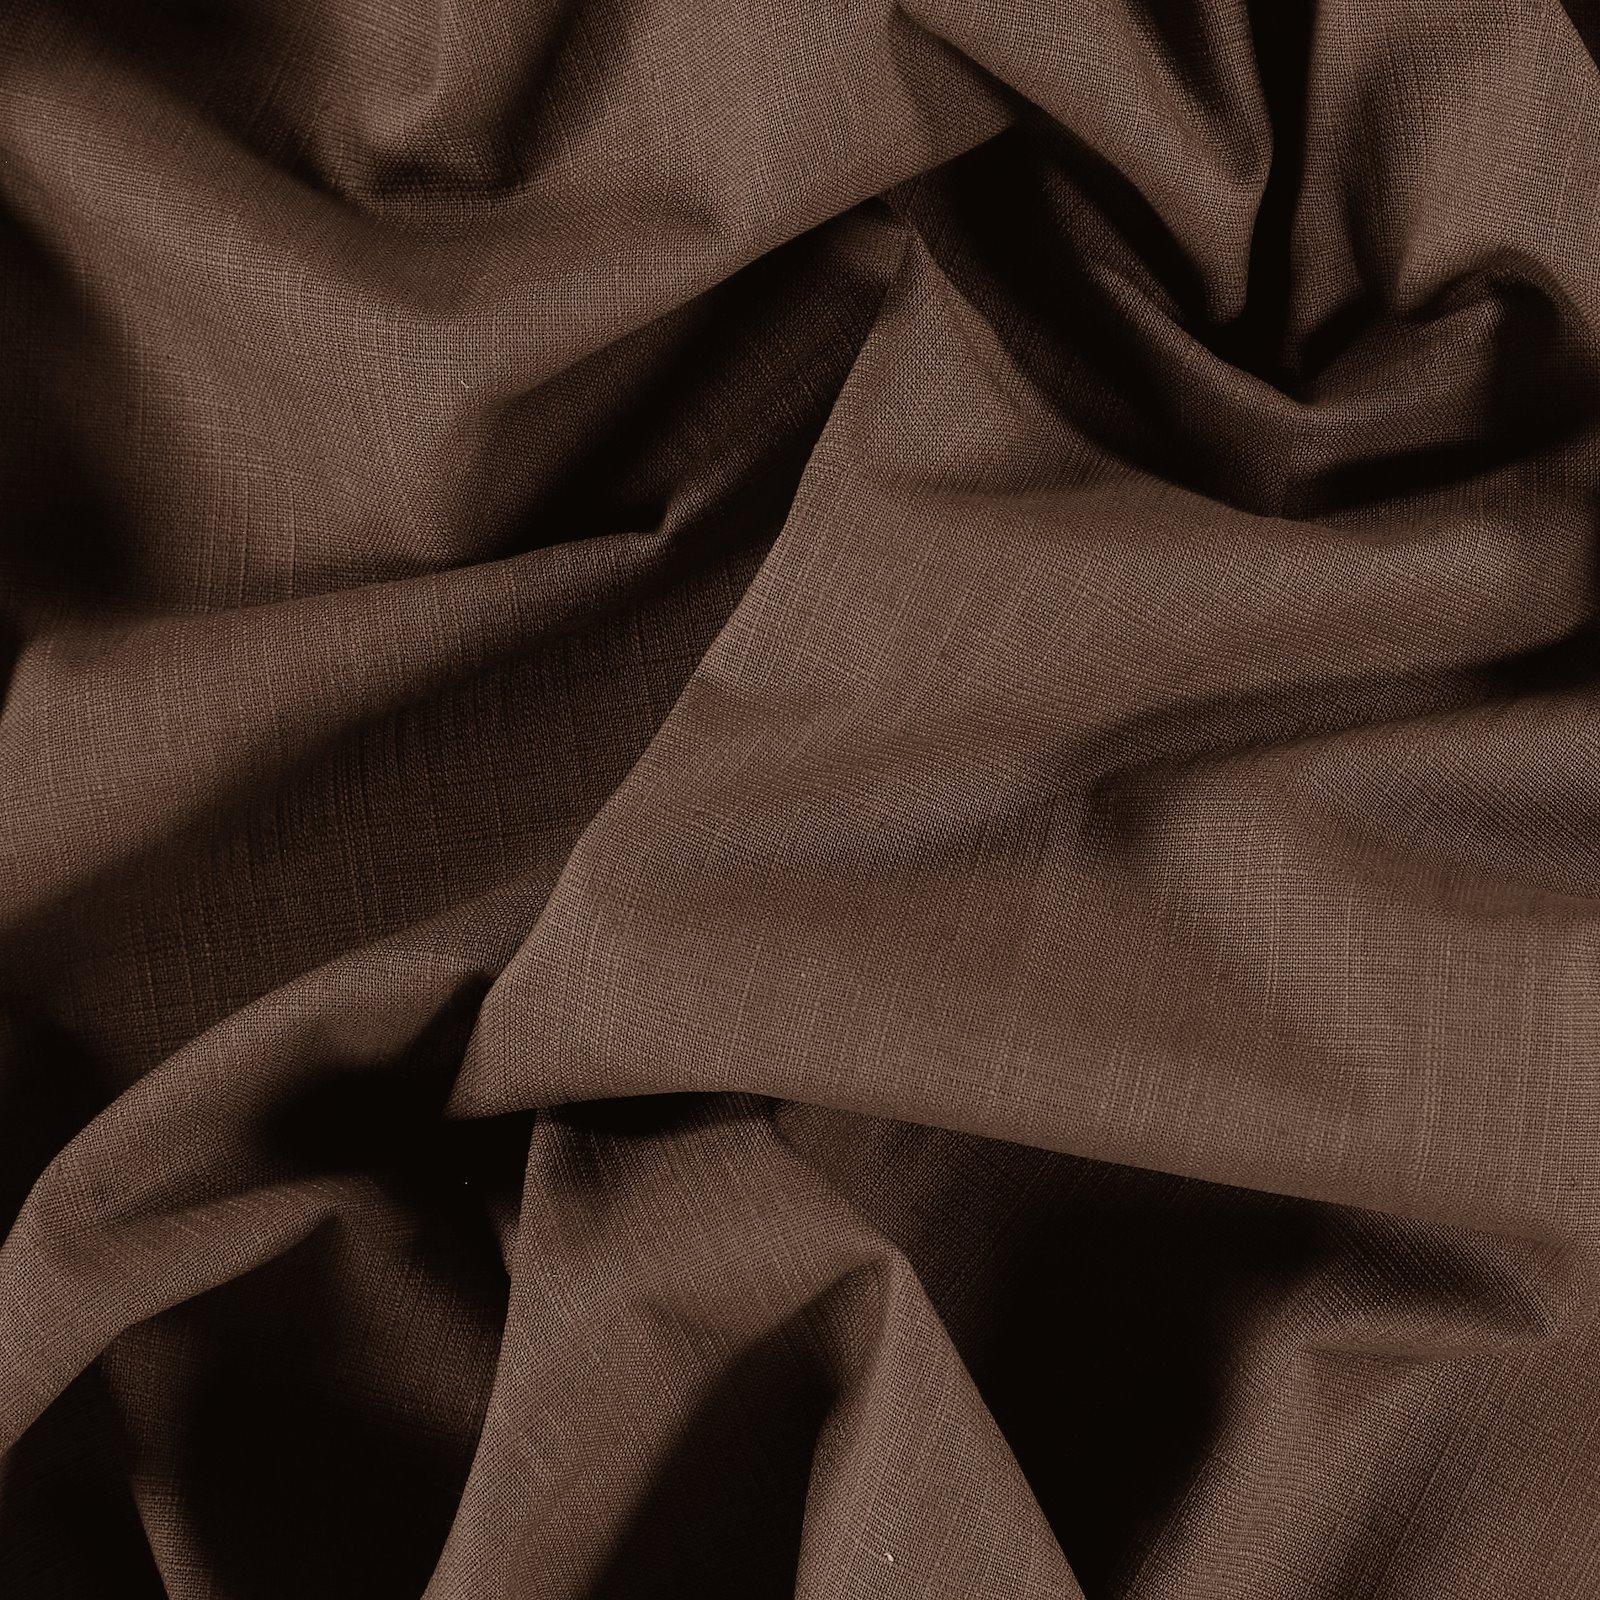 Yarn dyed brown